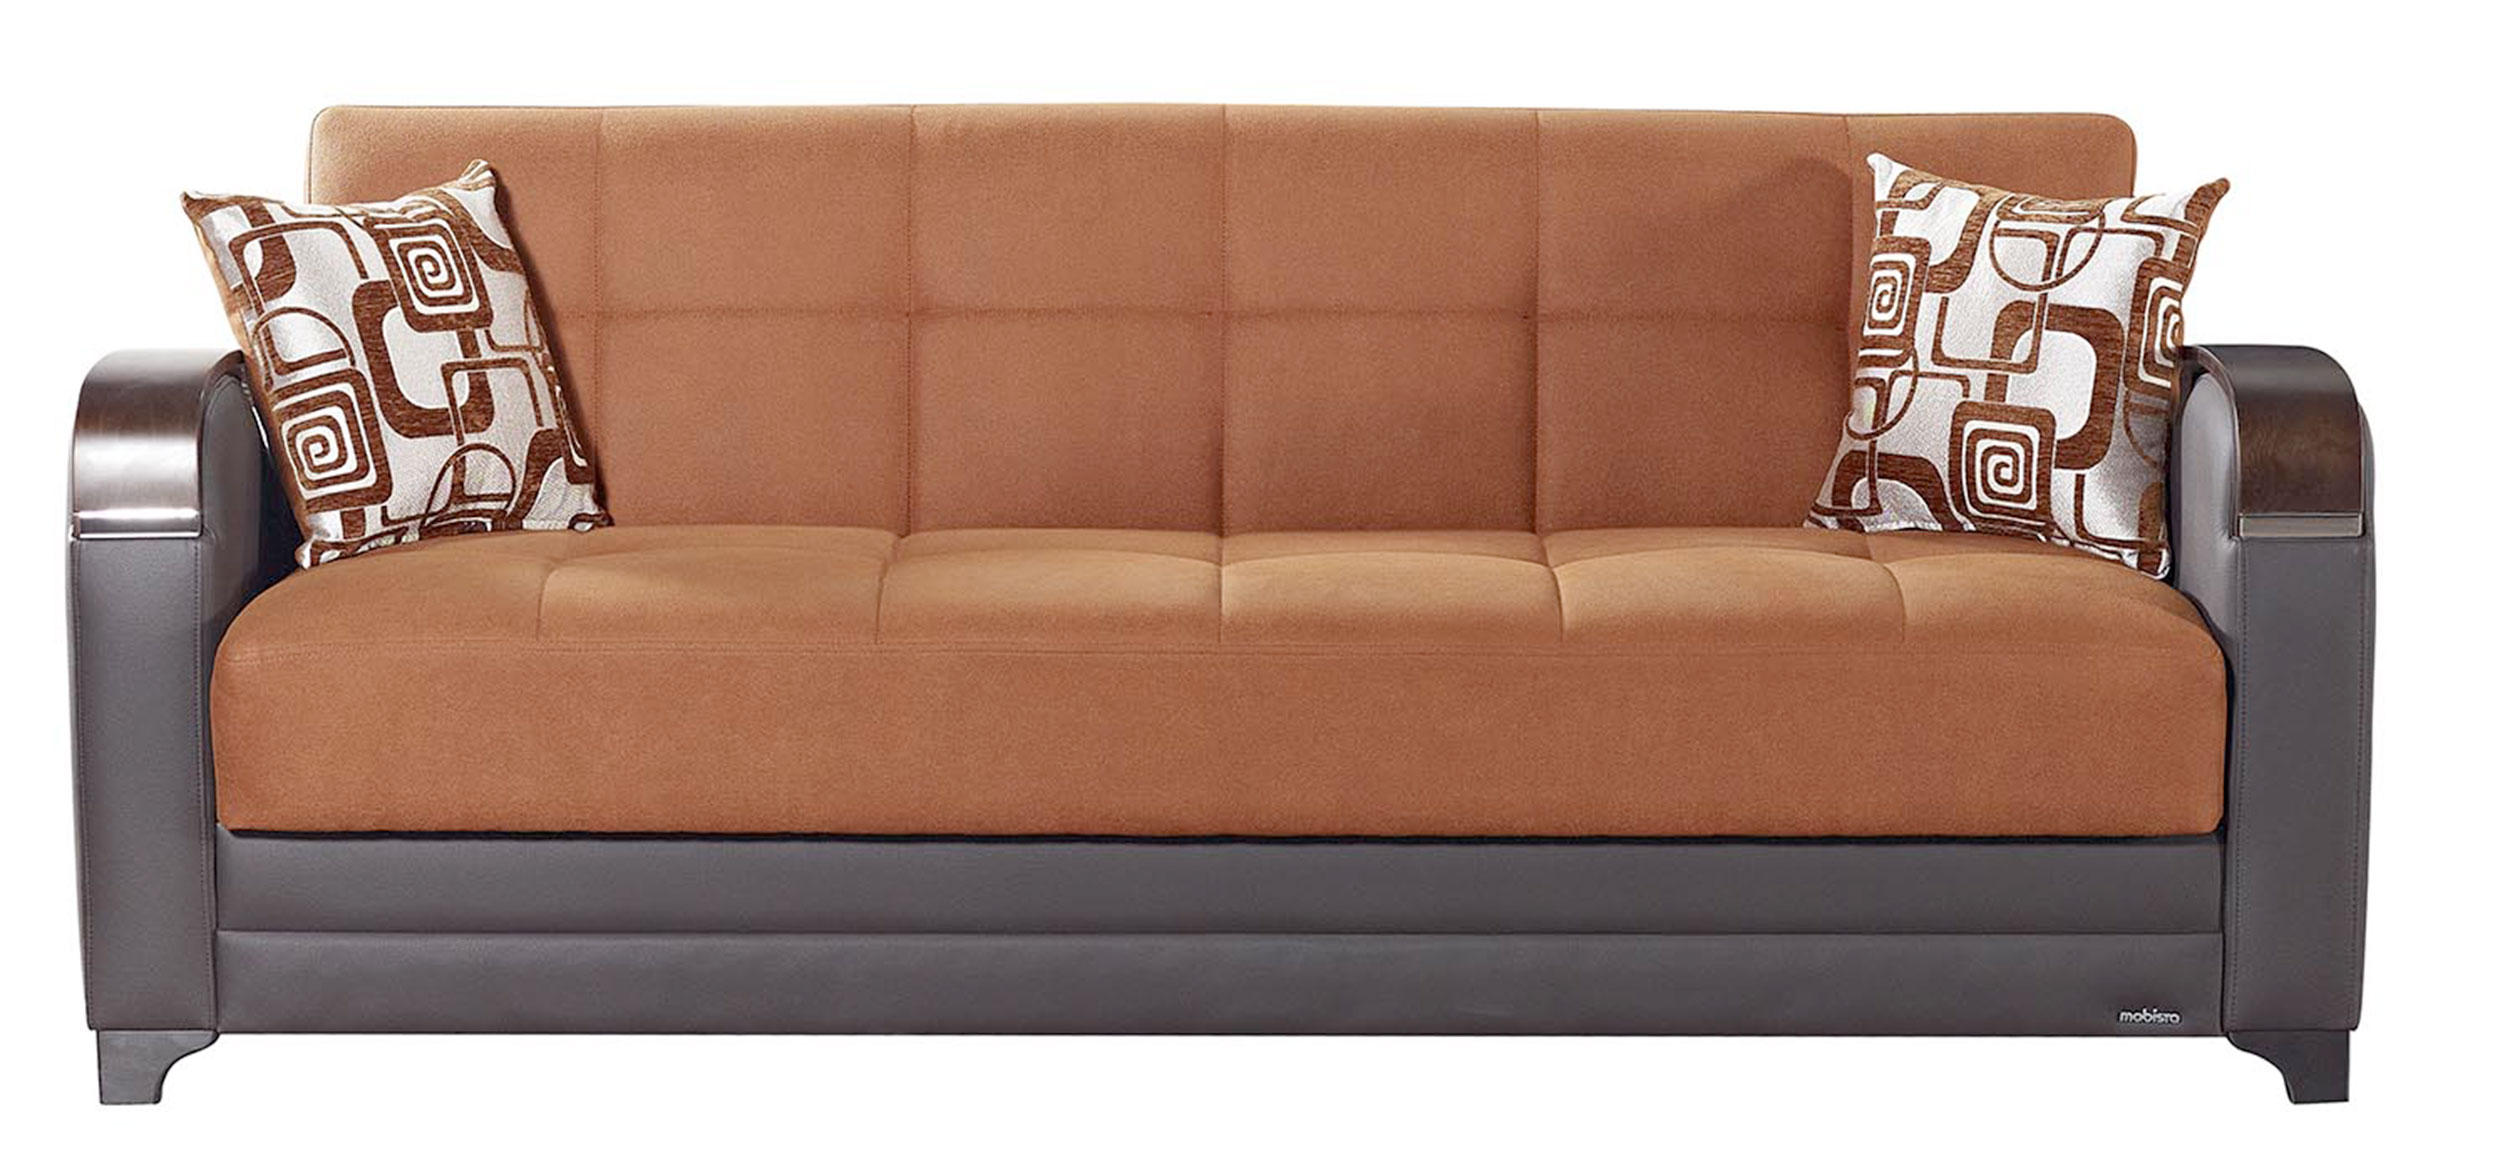 Etro Vintage Terra Cotta Fabric Sofa Bed by Mobista